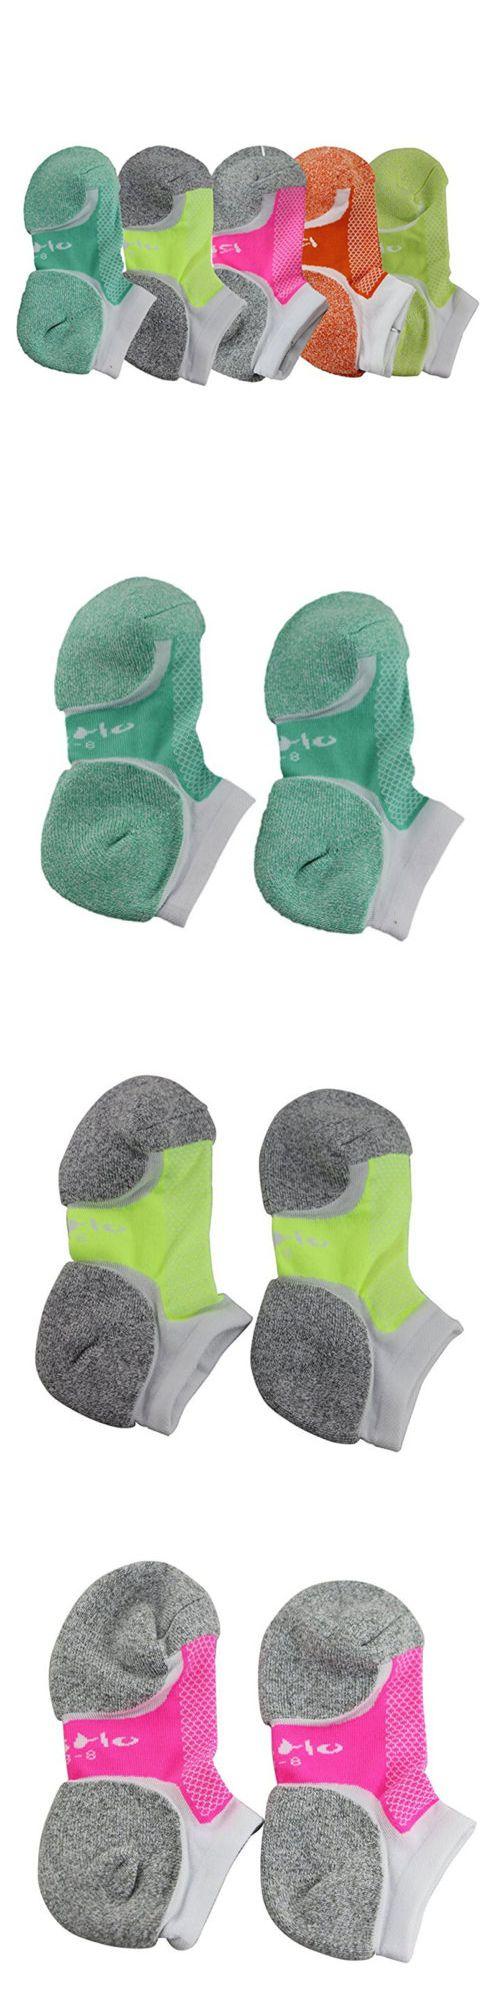 NWOT Women/'s Road Runner No Show Running Socks 6 Pair Size Medium White #238G